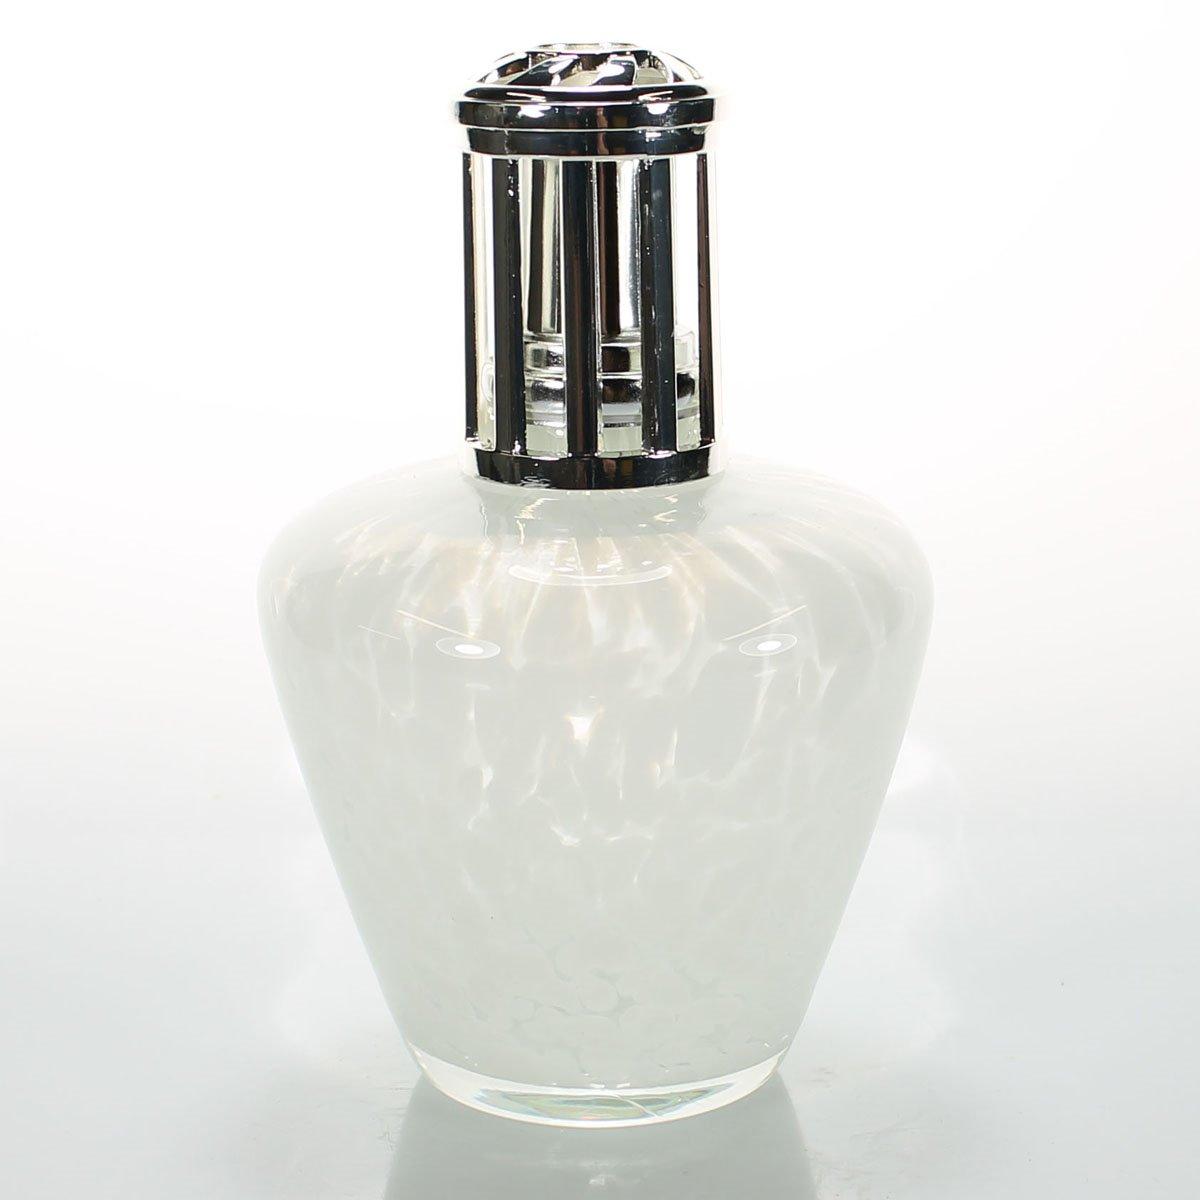 La-Tee-Da White Satin Lamp